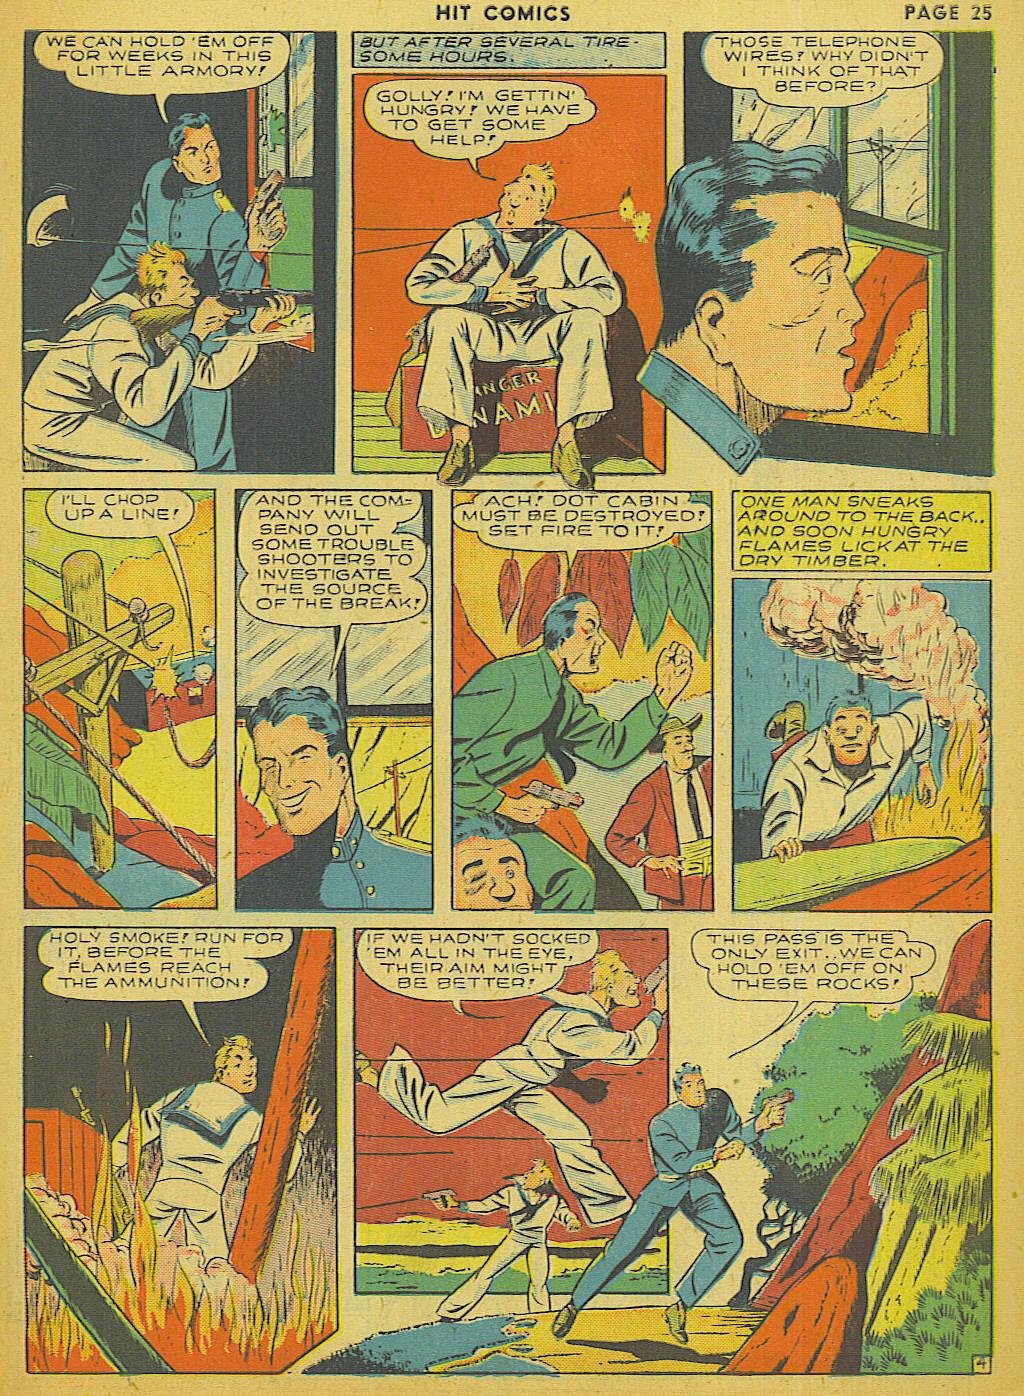 Read online Hit Comics comic -  Issue #13 - 27